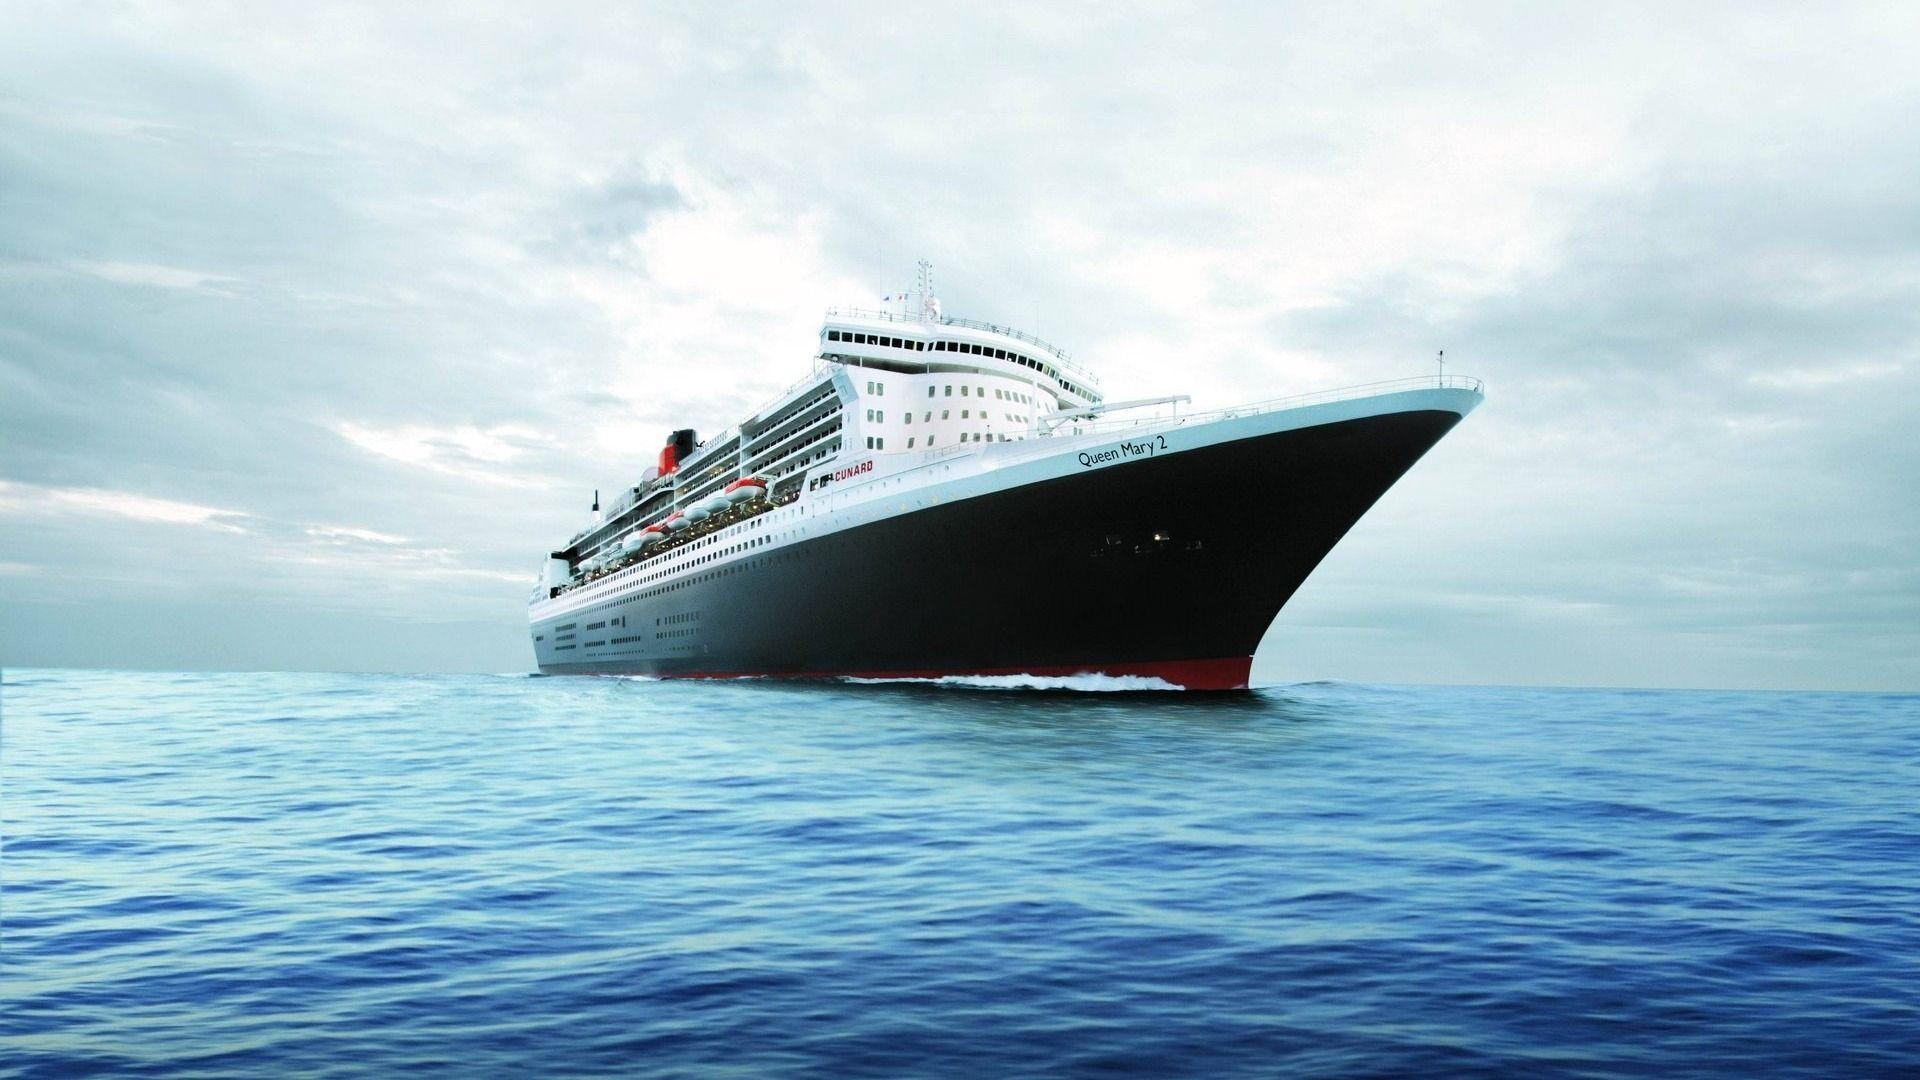 cruise ship wallpaper background - photo #30